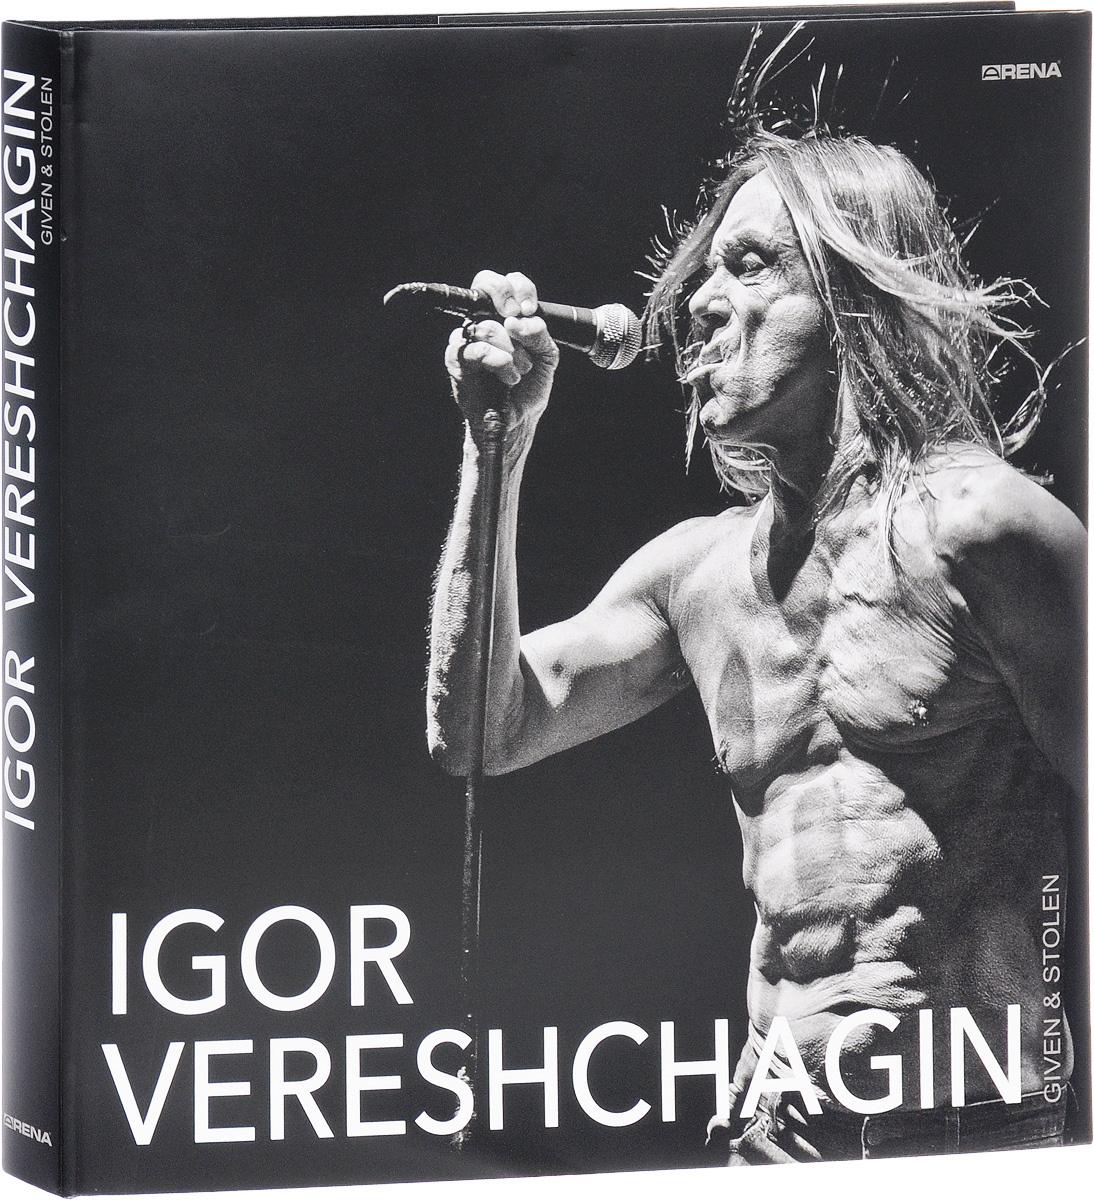 Igor Vereshchagin. Given & Stolen #1